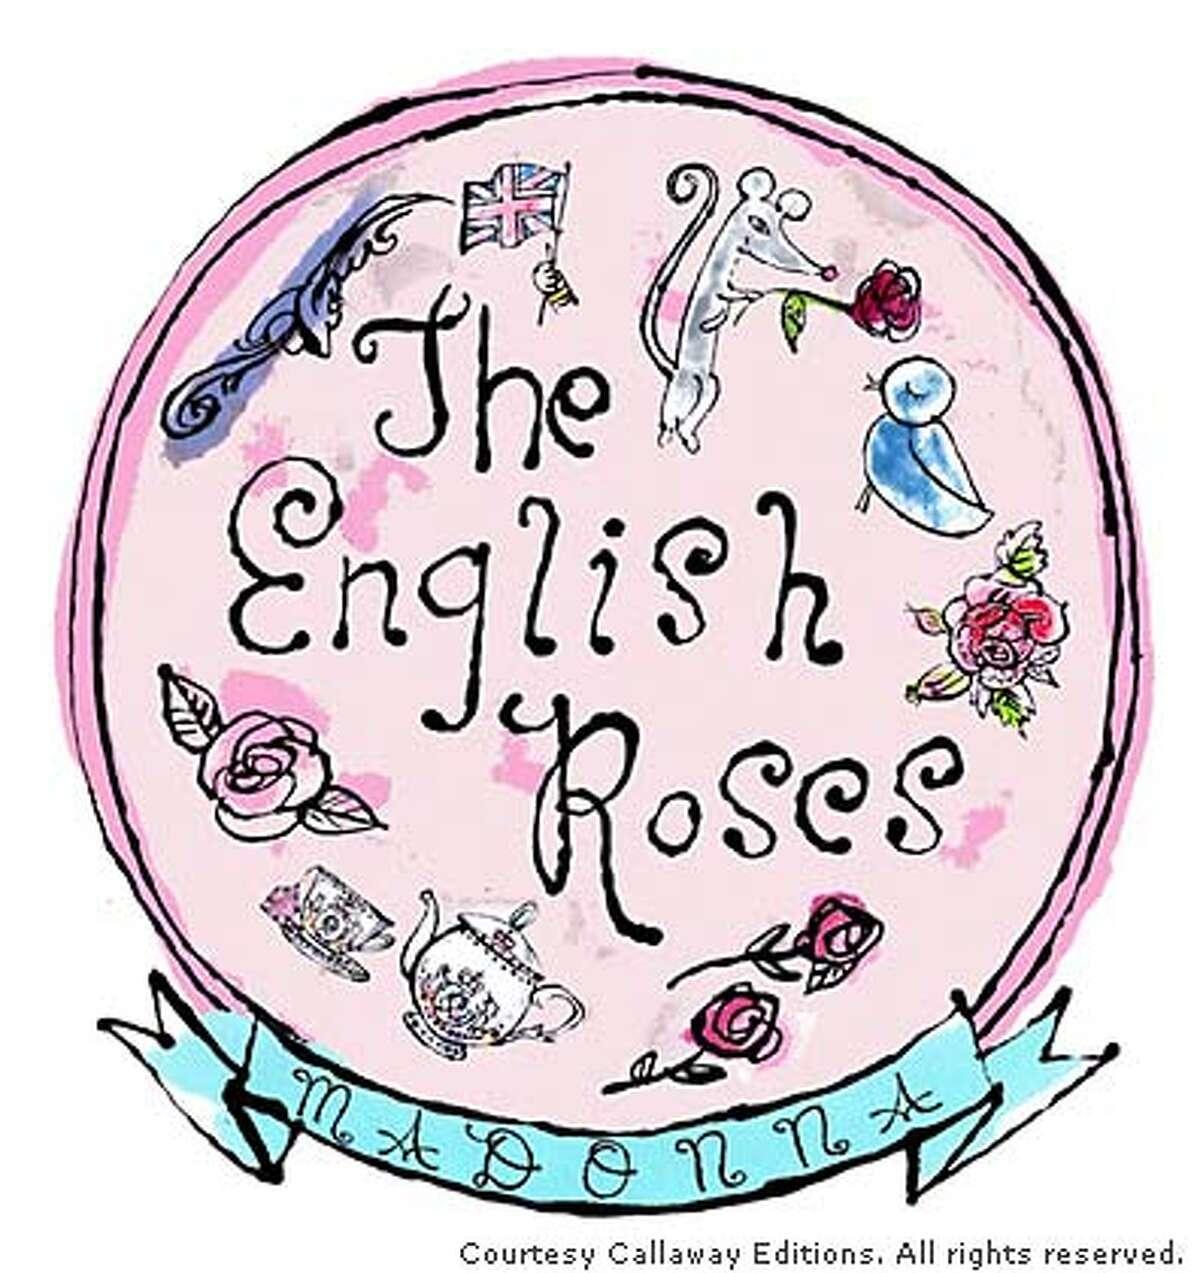 07/12/03   Color   5star   full   b1   Business   er 6273   THE ENGLISH ROSES ILLUSTRATION